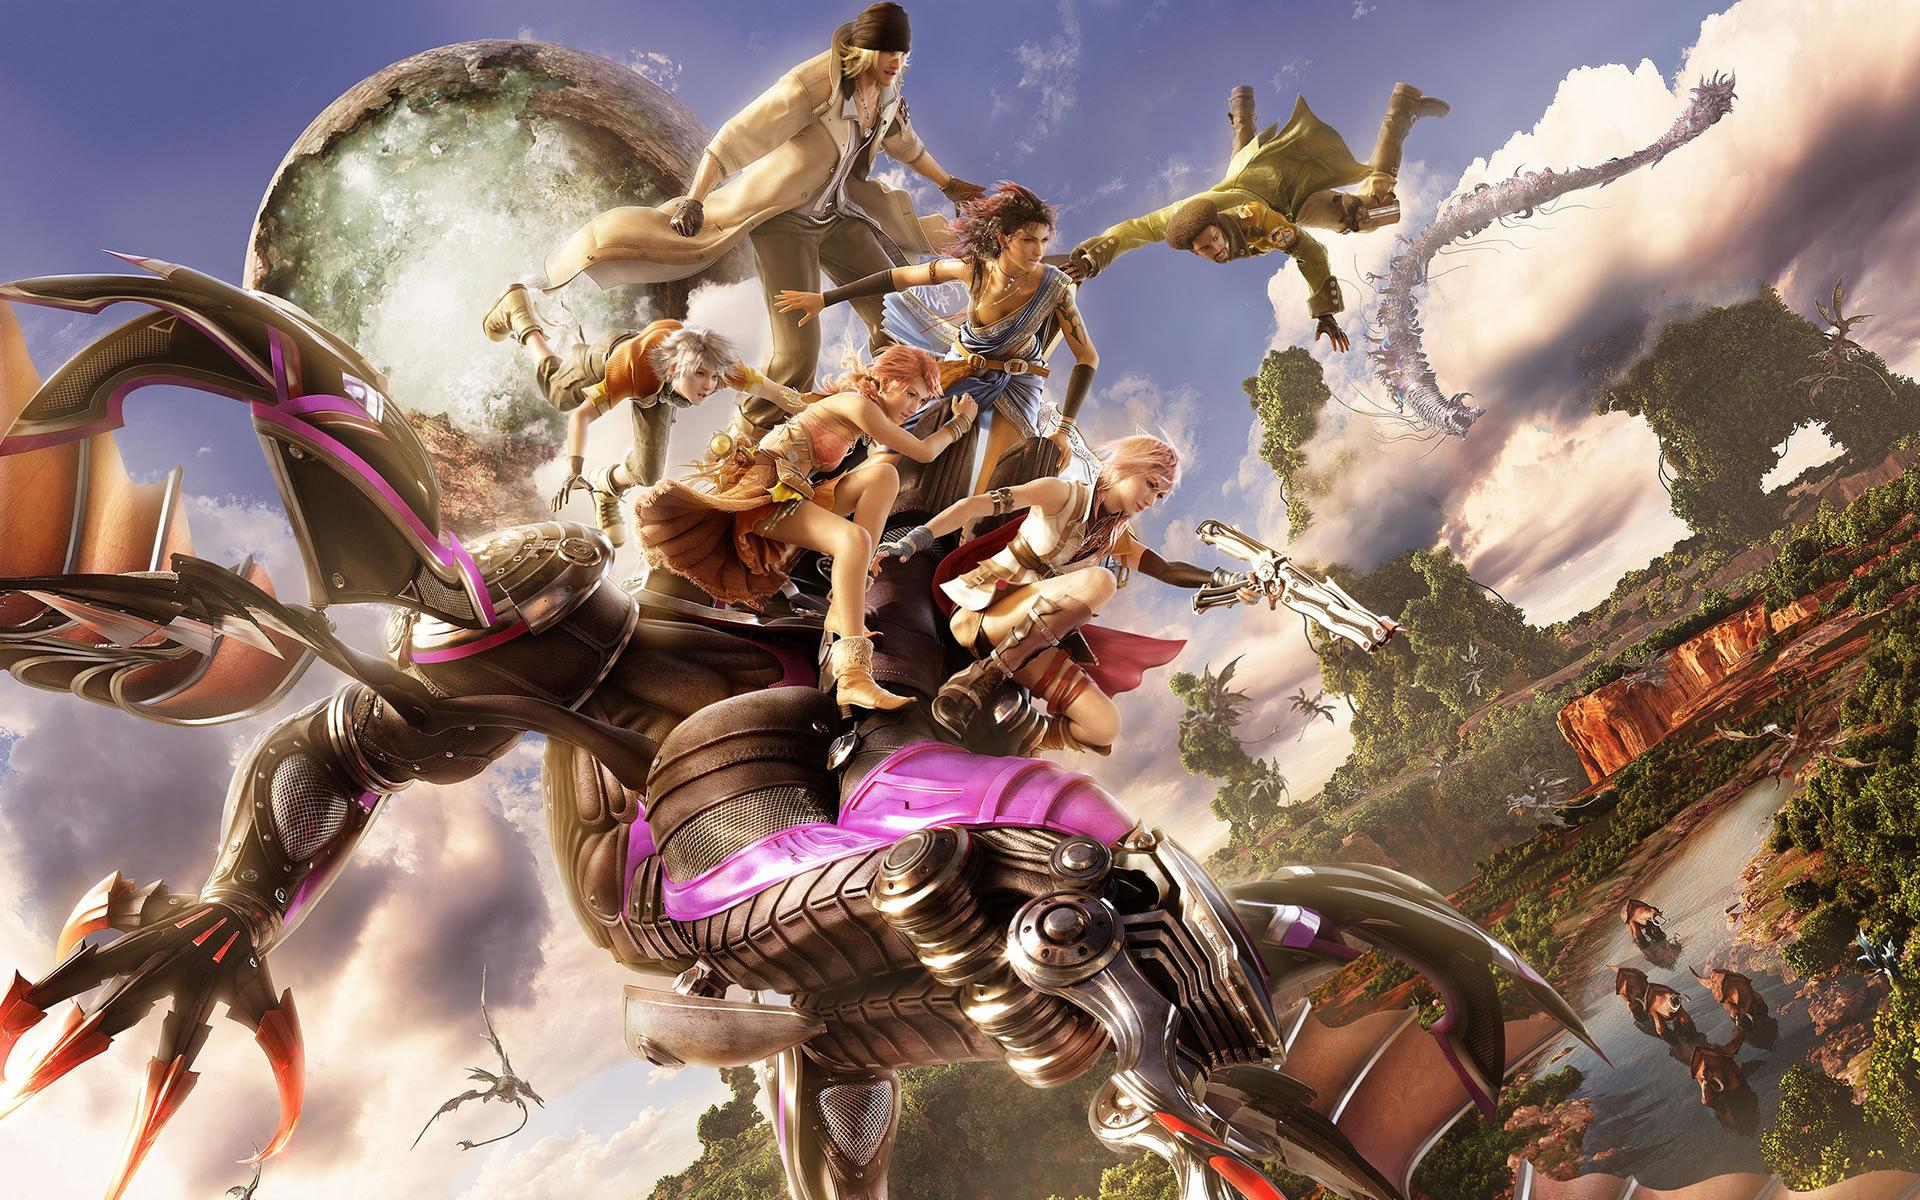 33613 descargar fondo de pantalla Juegos, Final Fantasy: protectores de pantalla e imágenes gratis